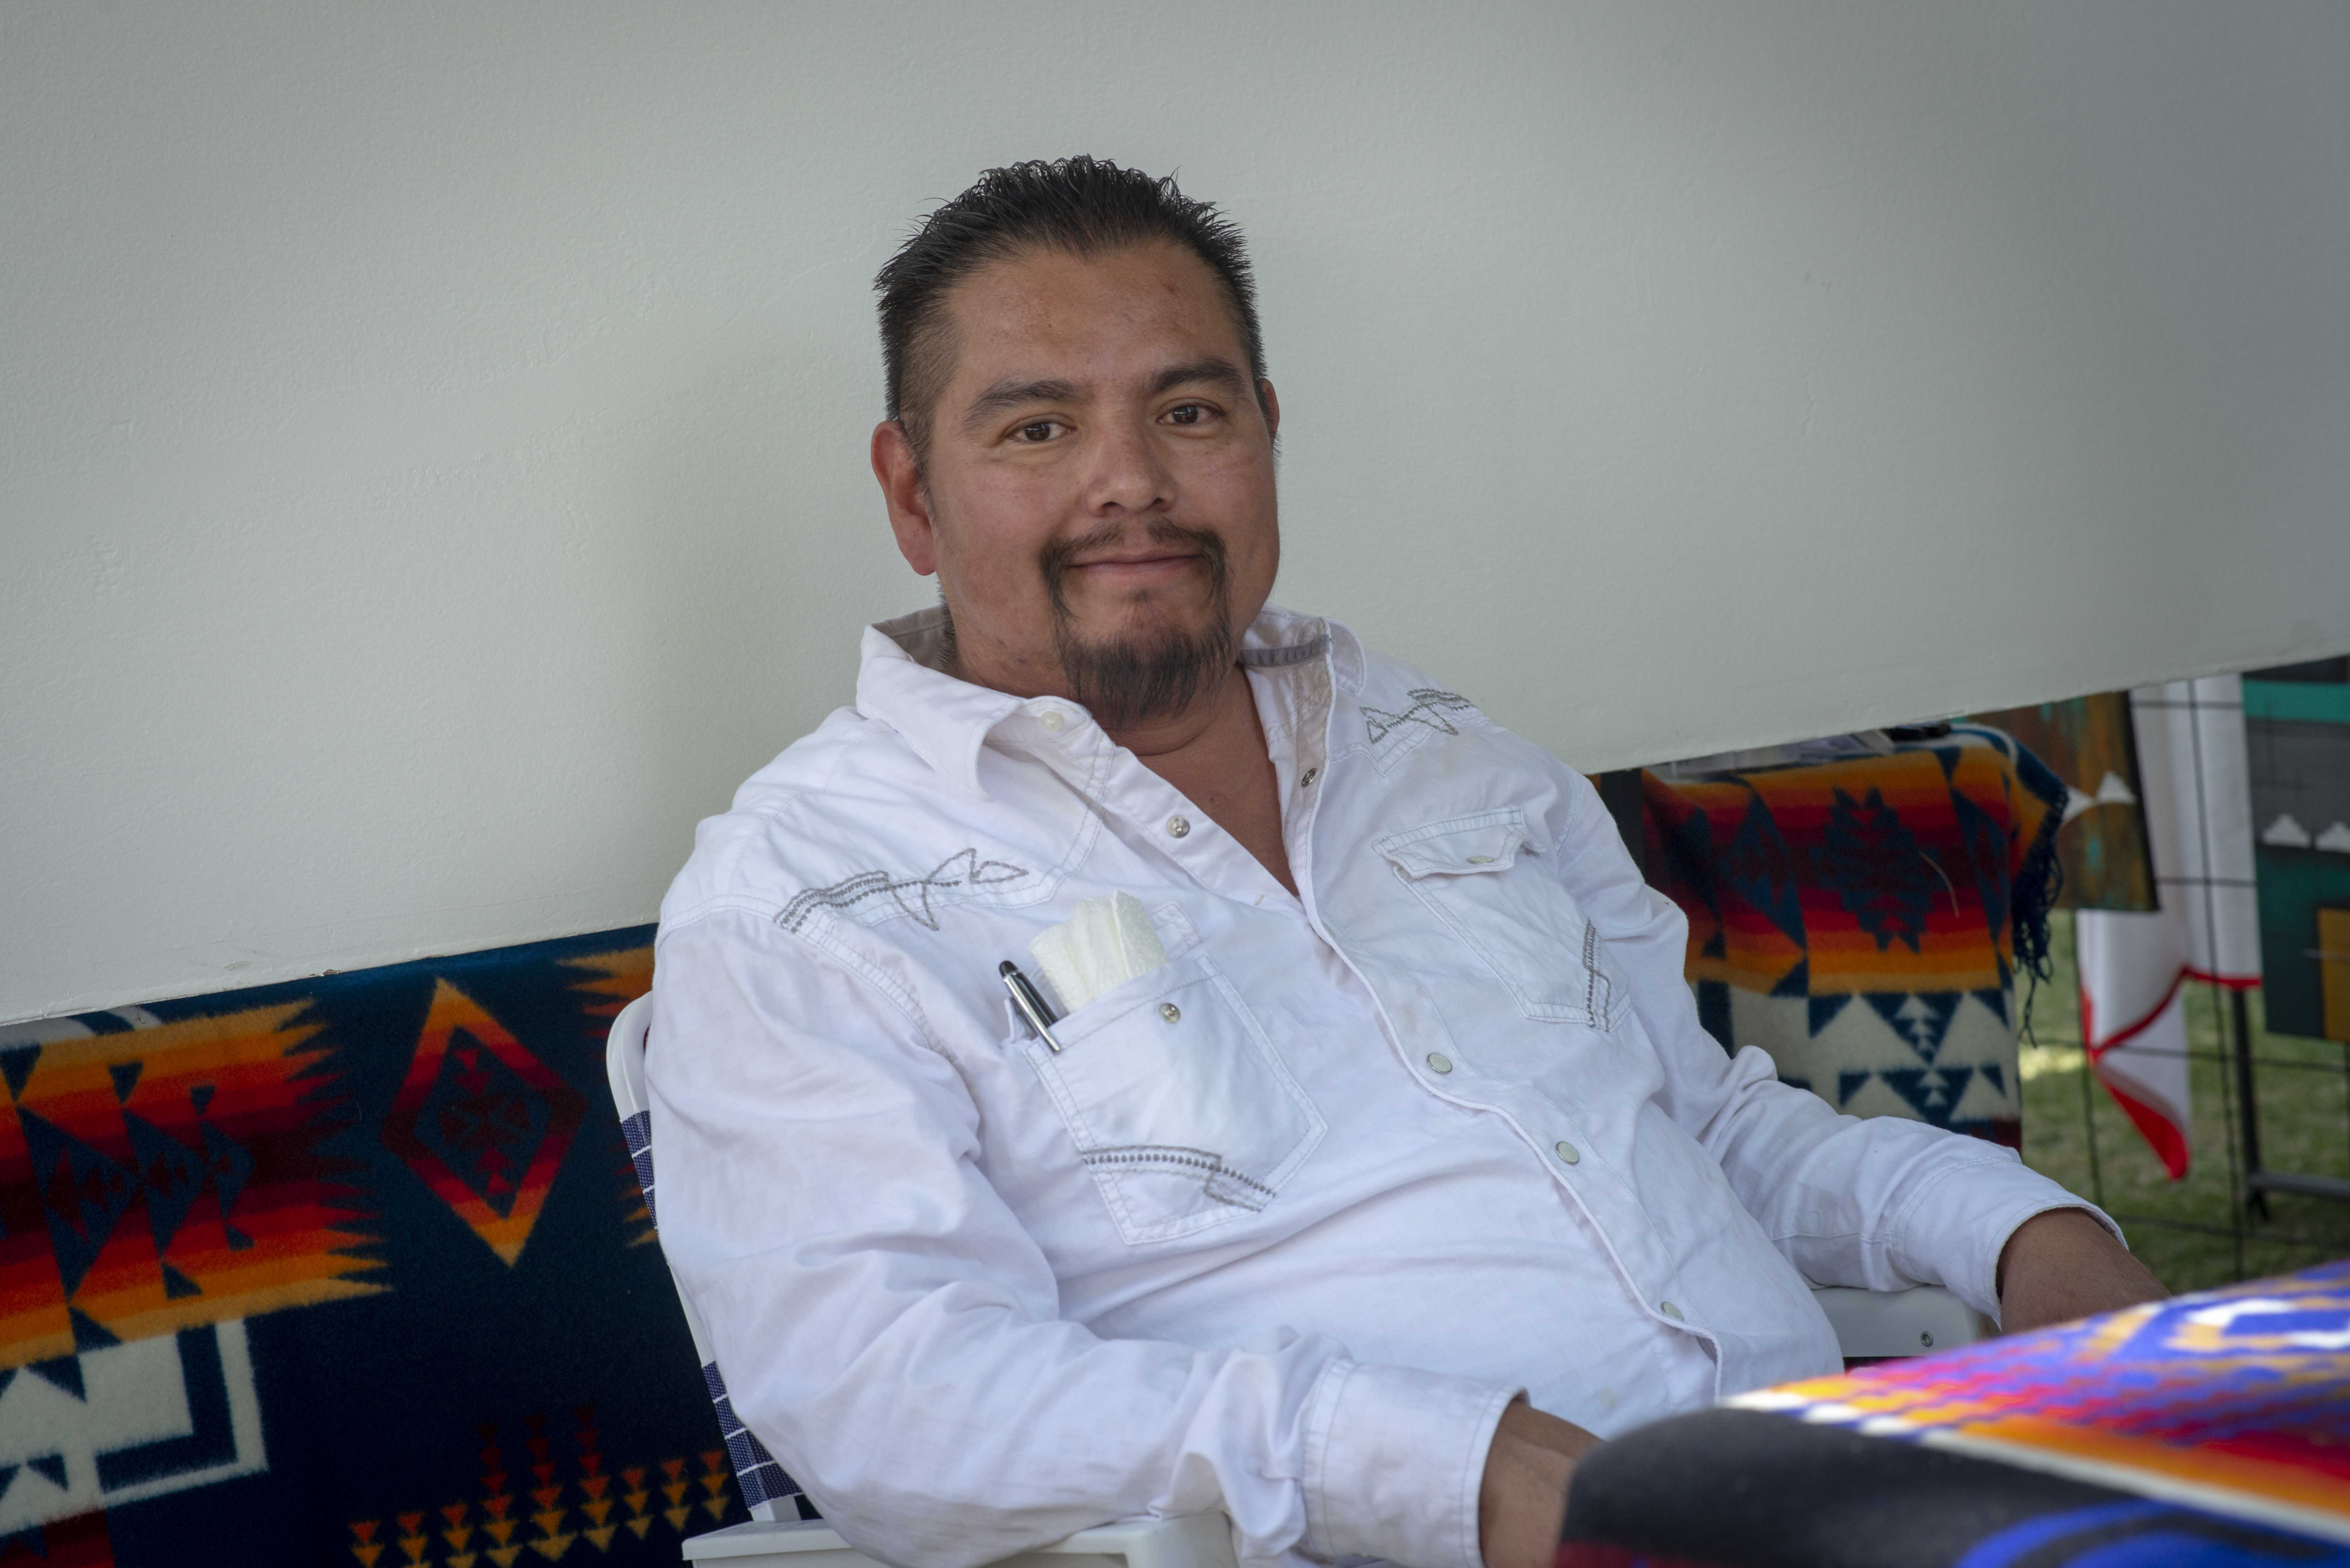 Isaiah Ortiz